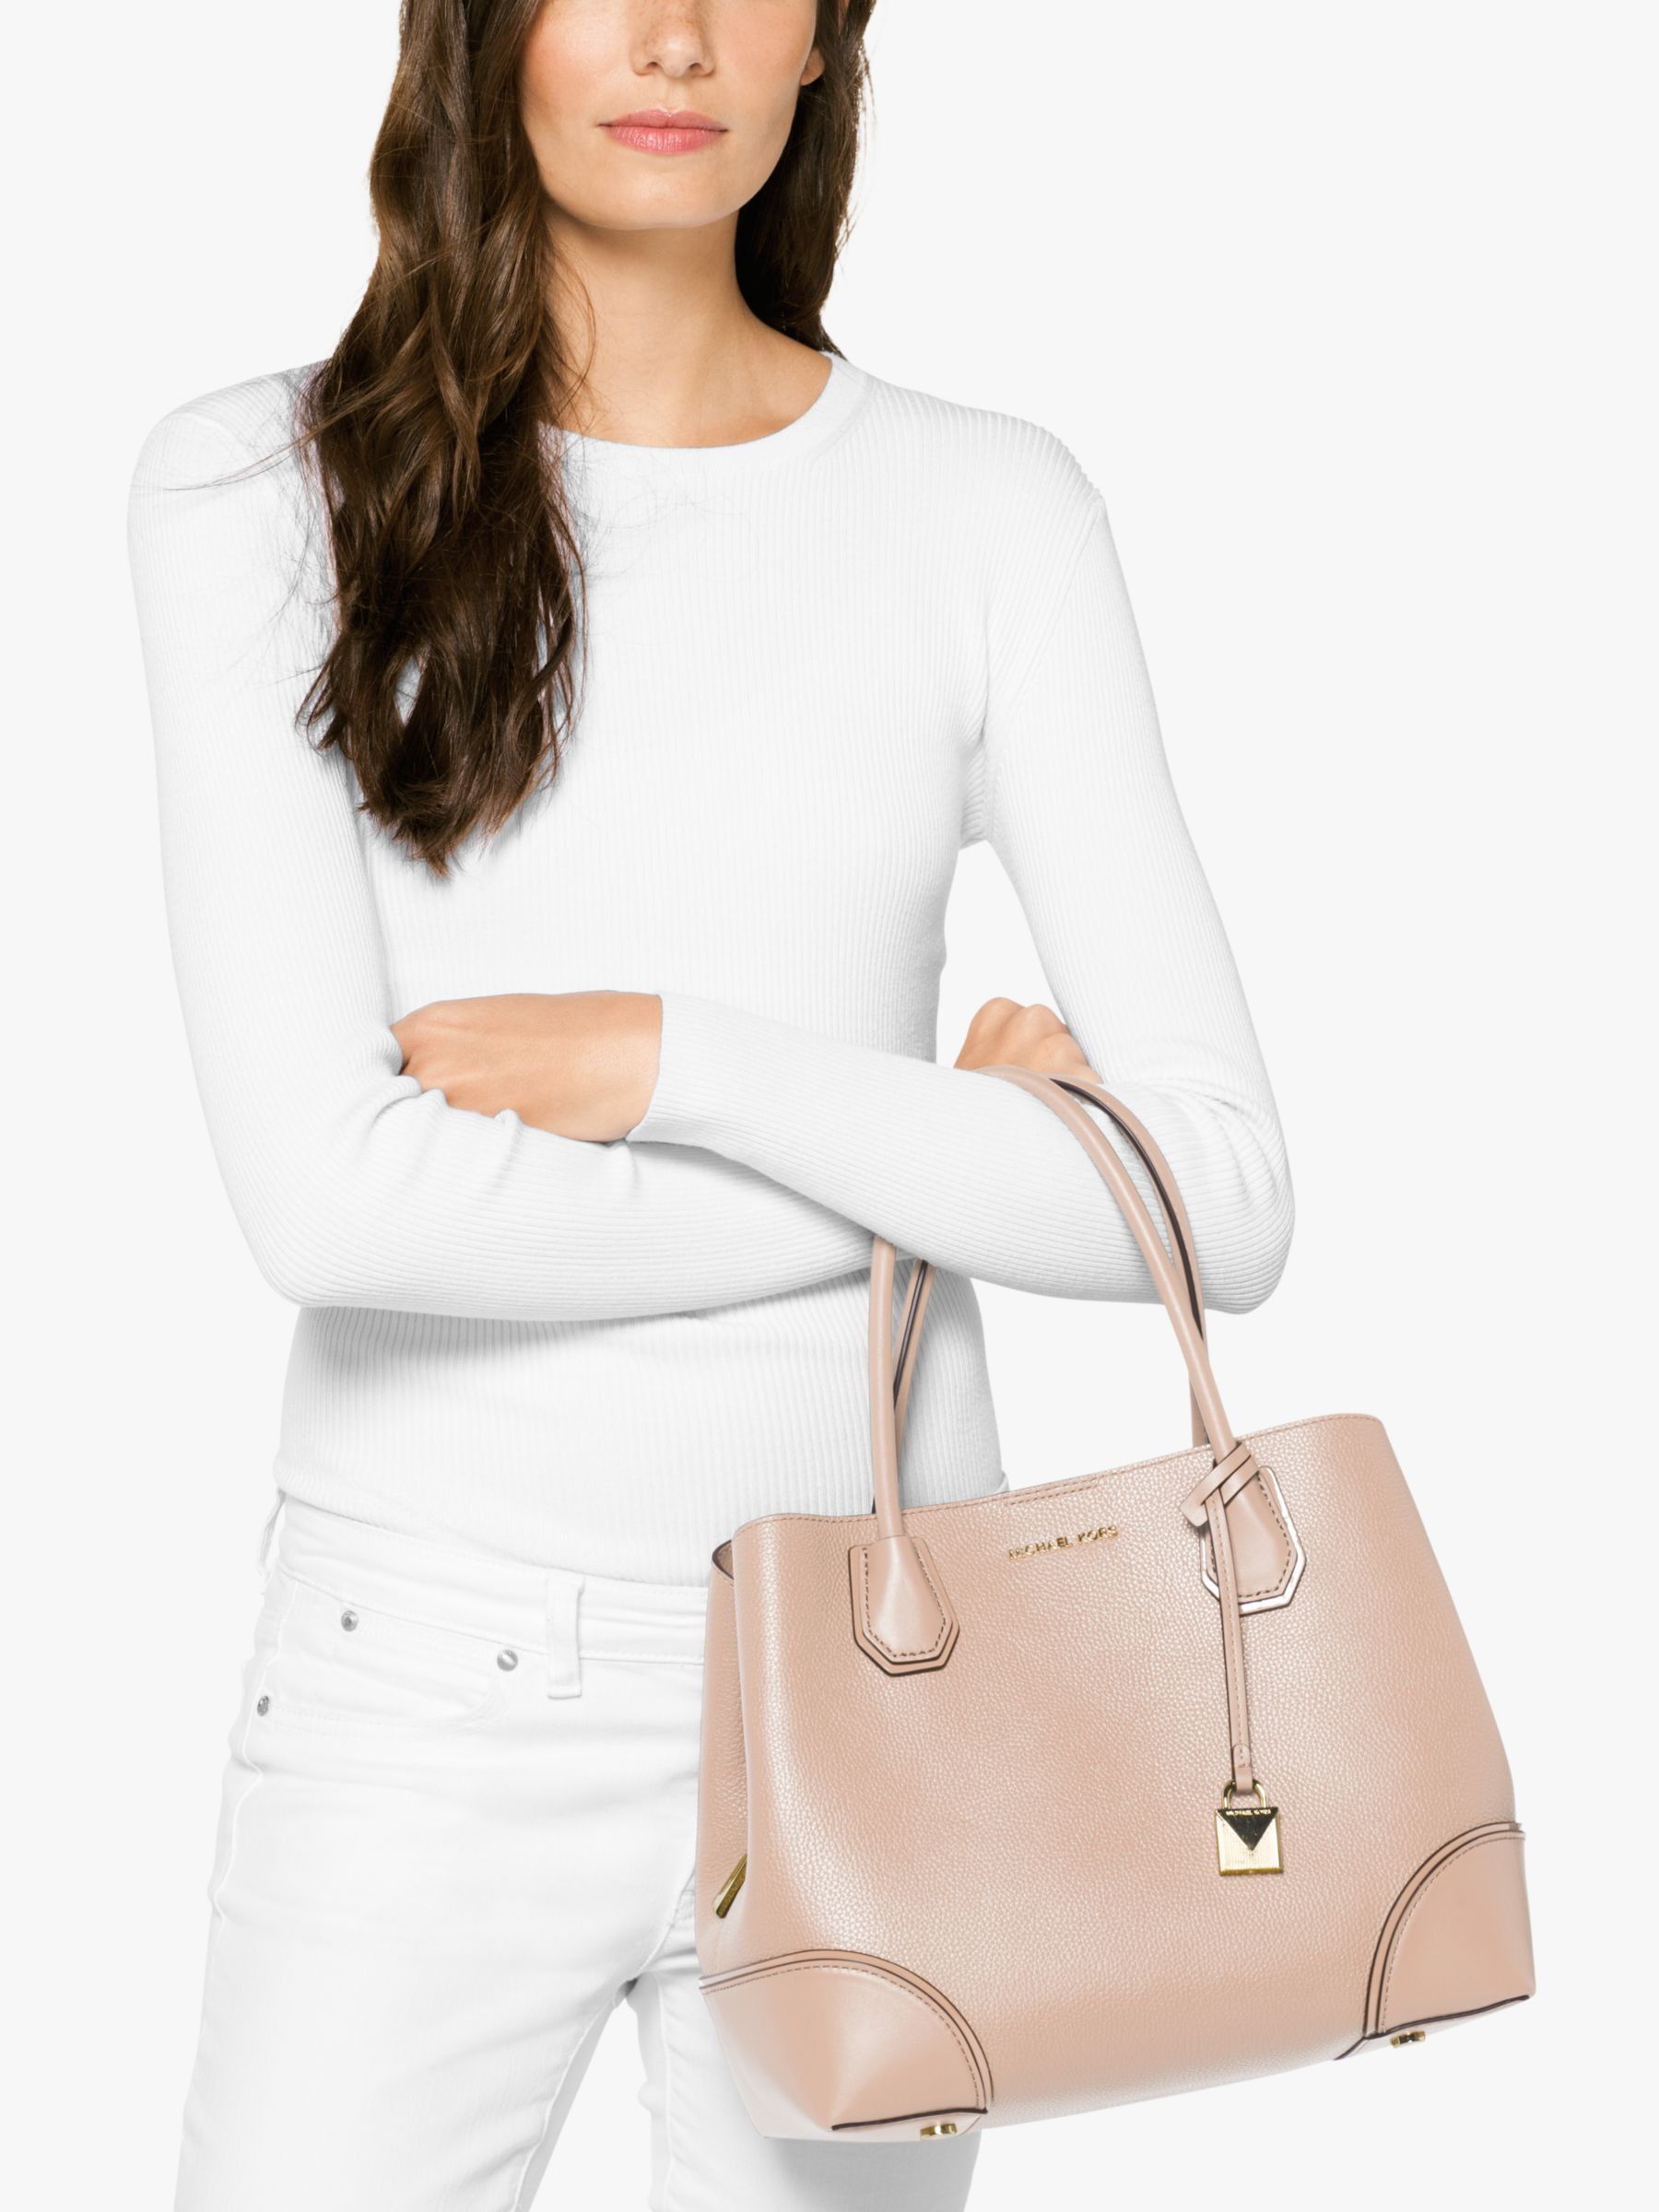 MICHAEL by Michael Kors Mercer Soft Pink Gallery Medium Tote Bag